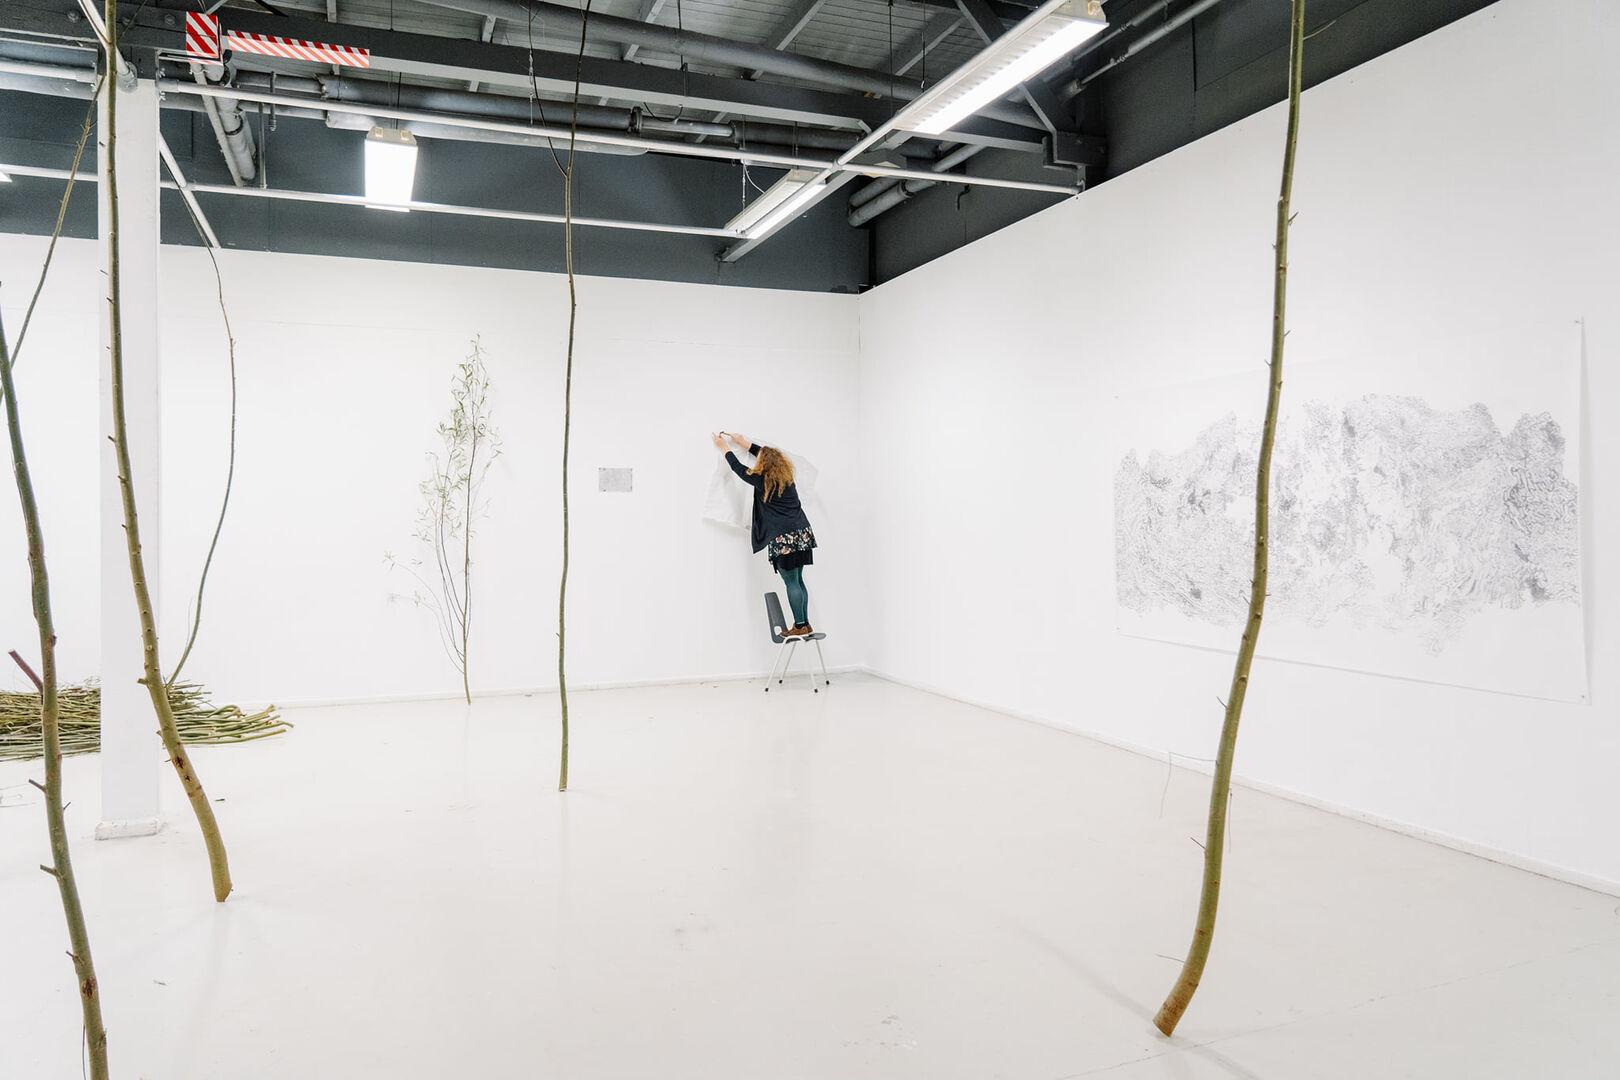 Duo tentoonstelling Roos Vogels met mentor Gam Bodenhausen